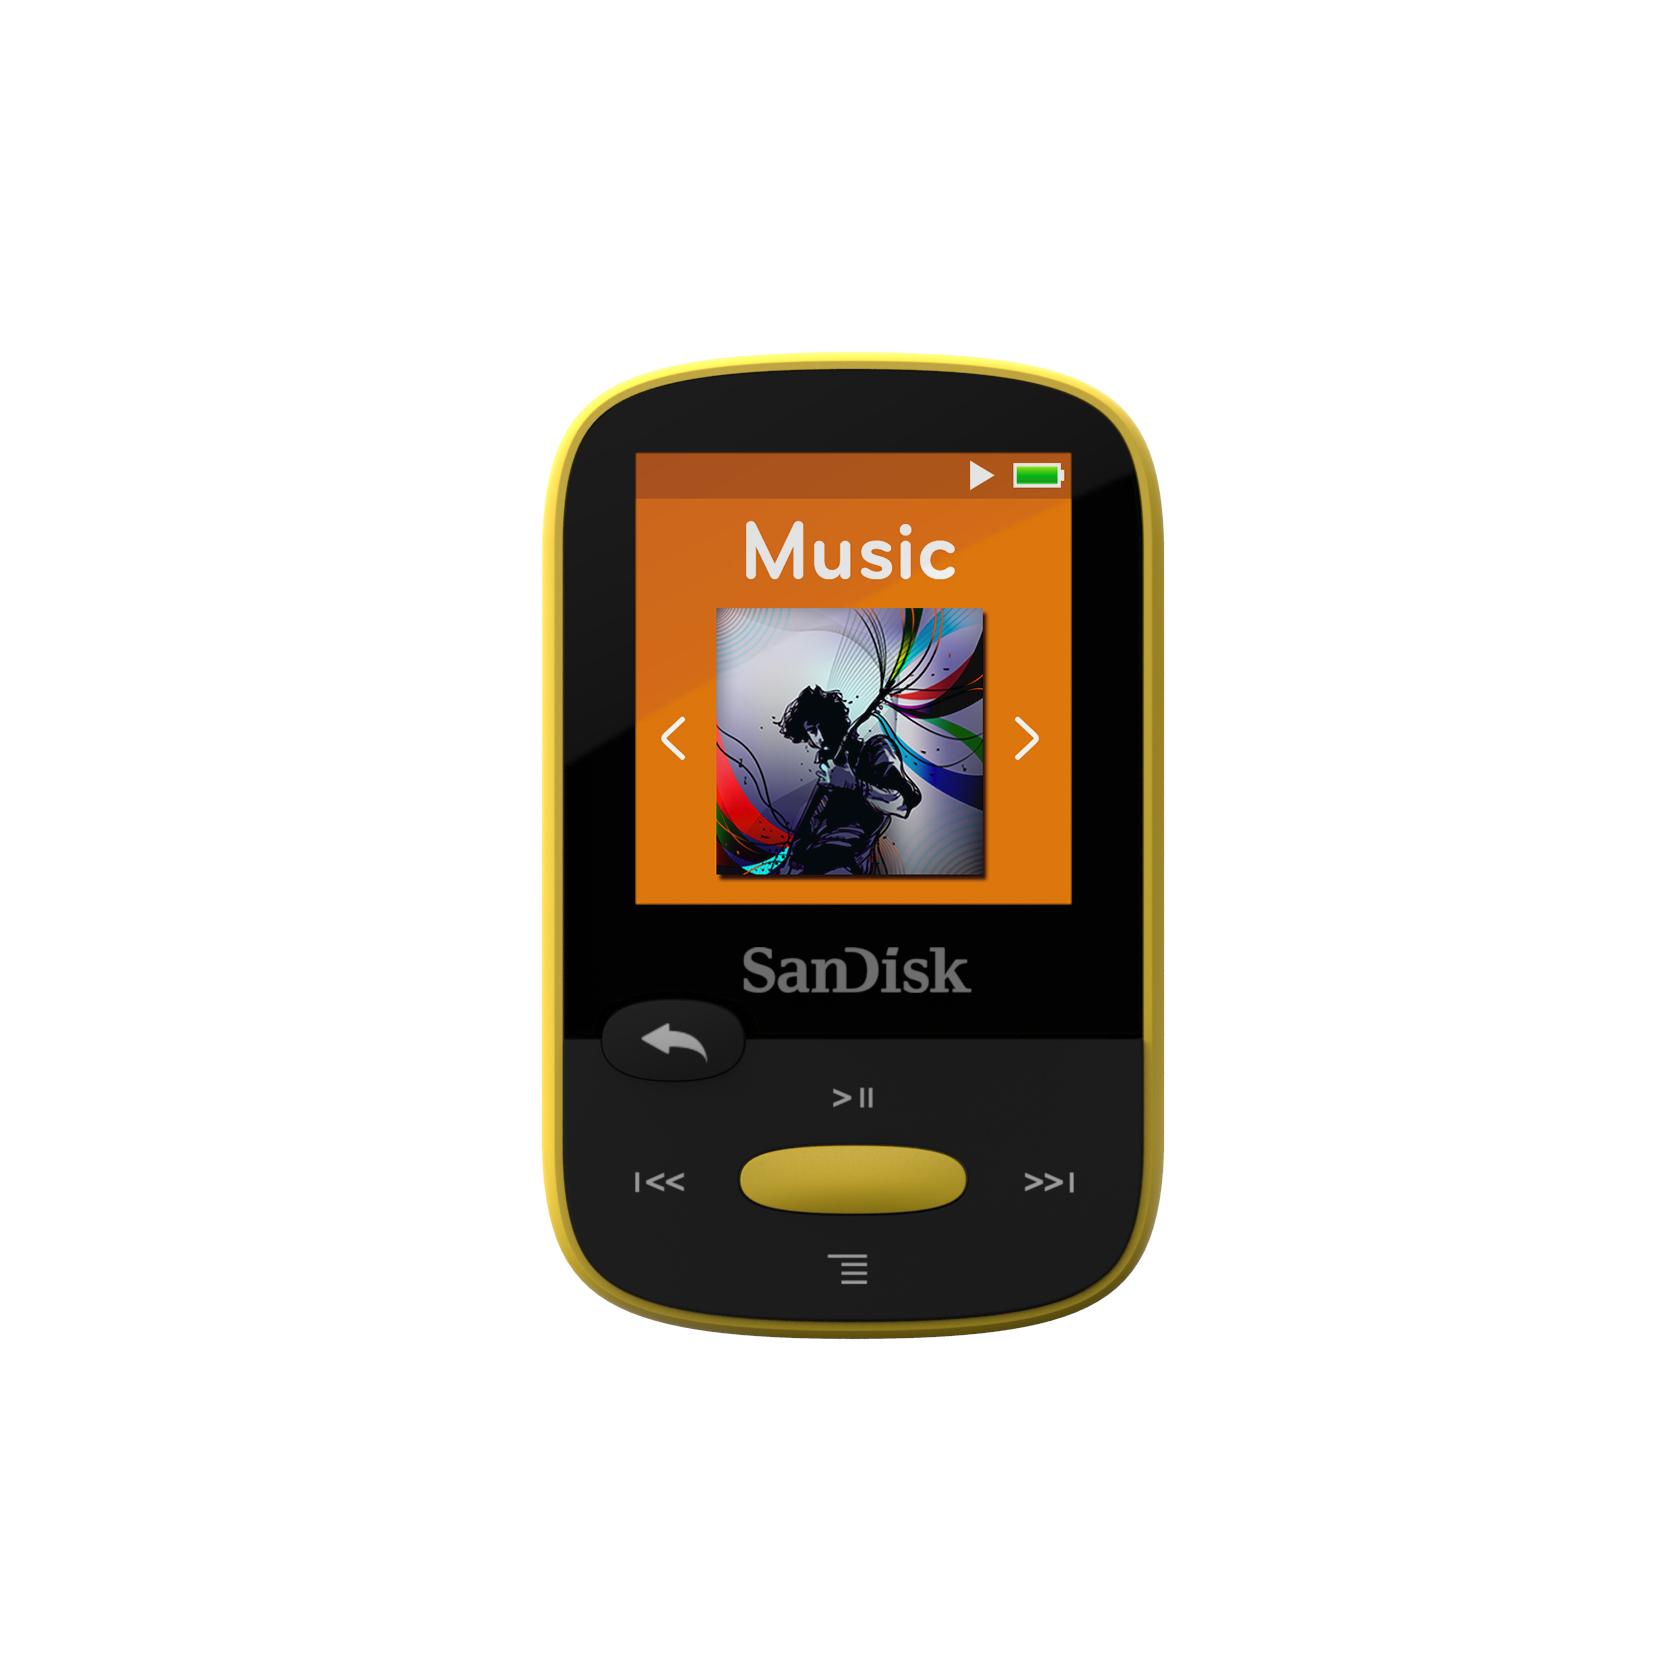 SanDisk Clip Jam 8GB MP3-Player Pink